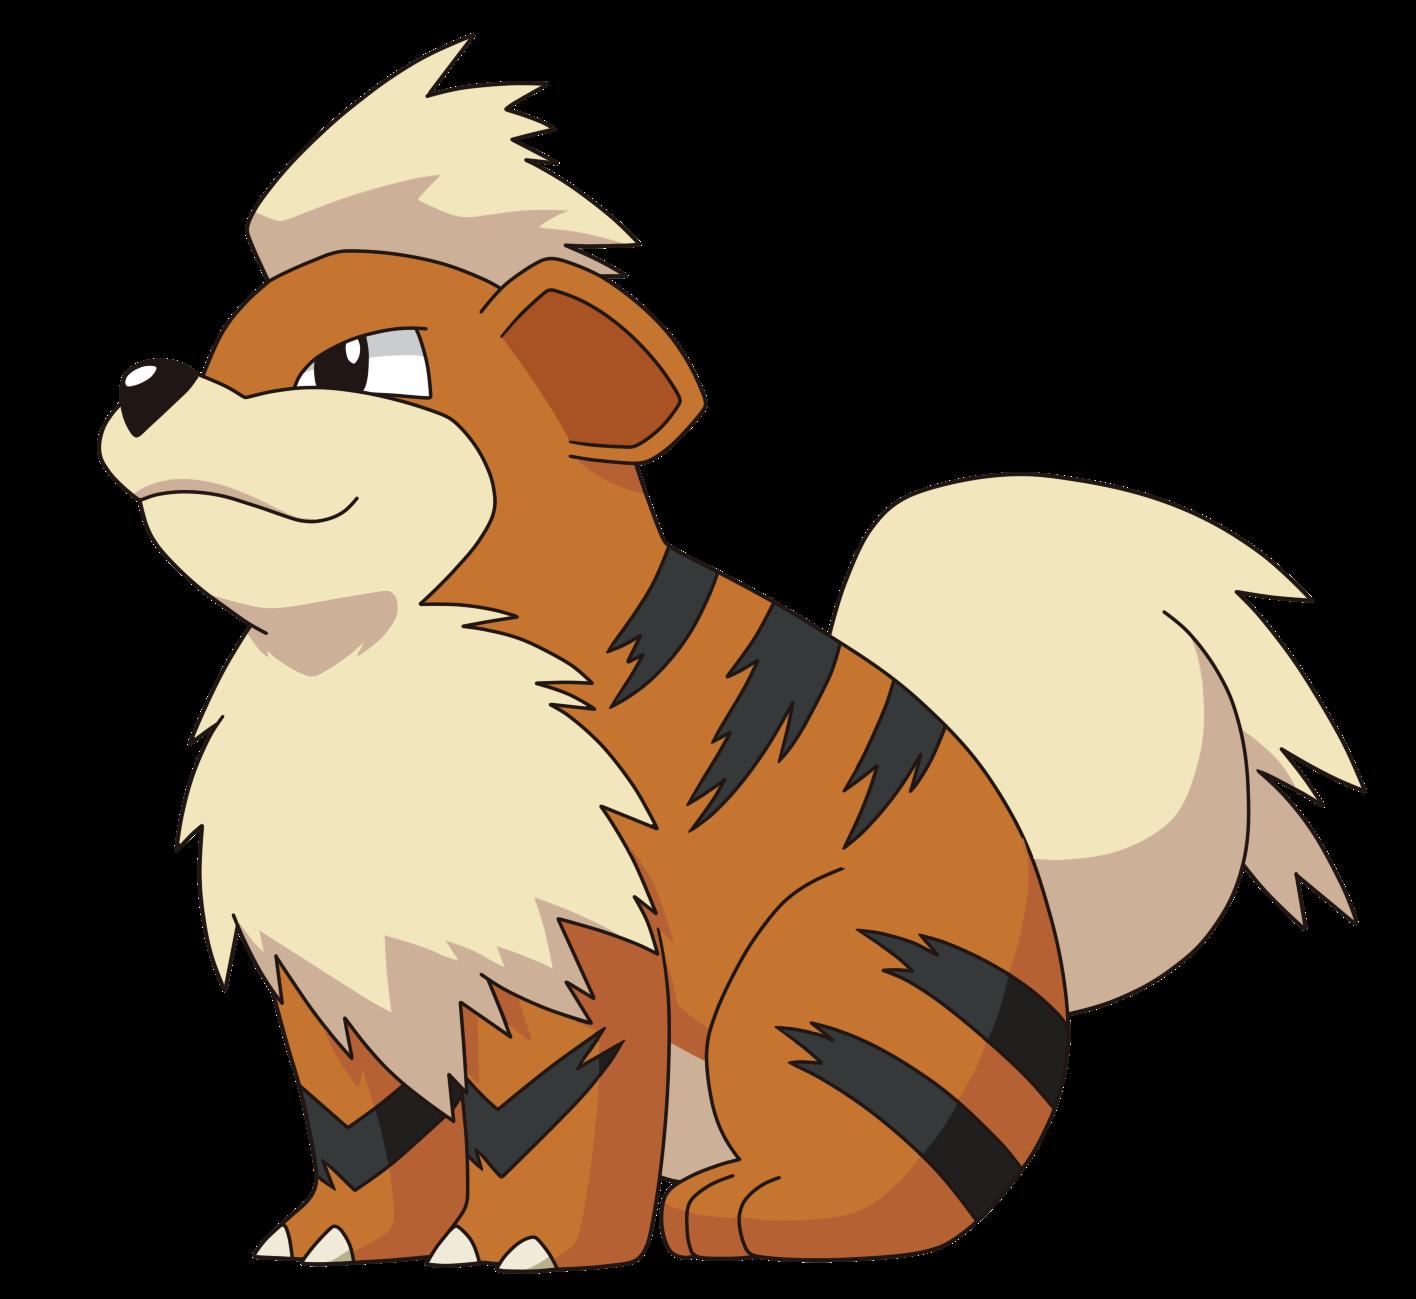 Pokemon Growlithe | Pokemon Growlithe And Arcanine Images ...